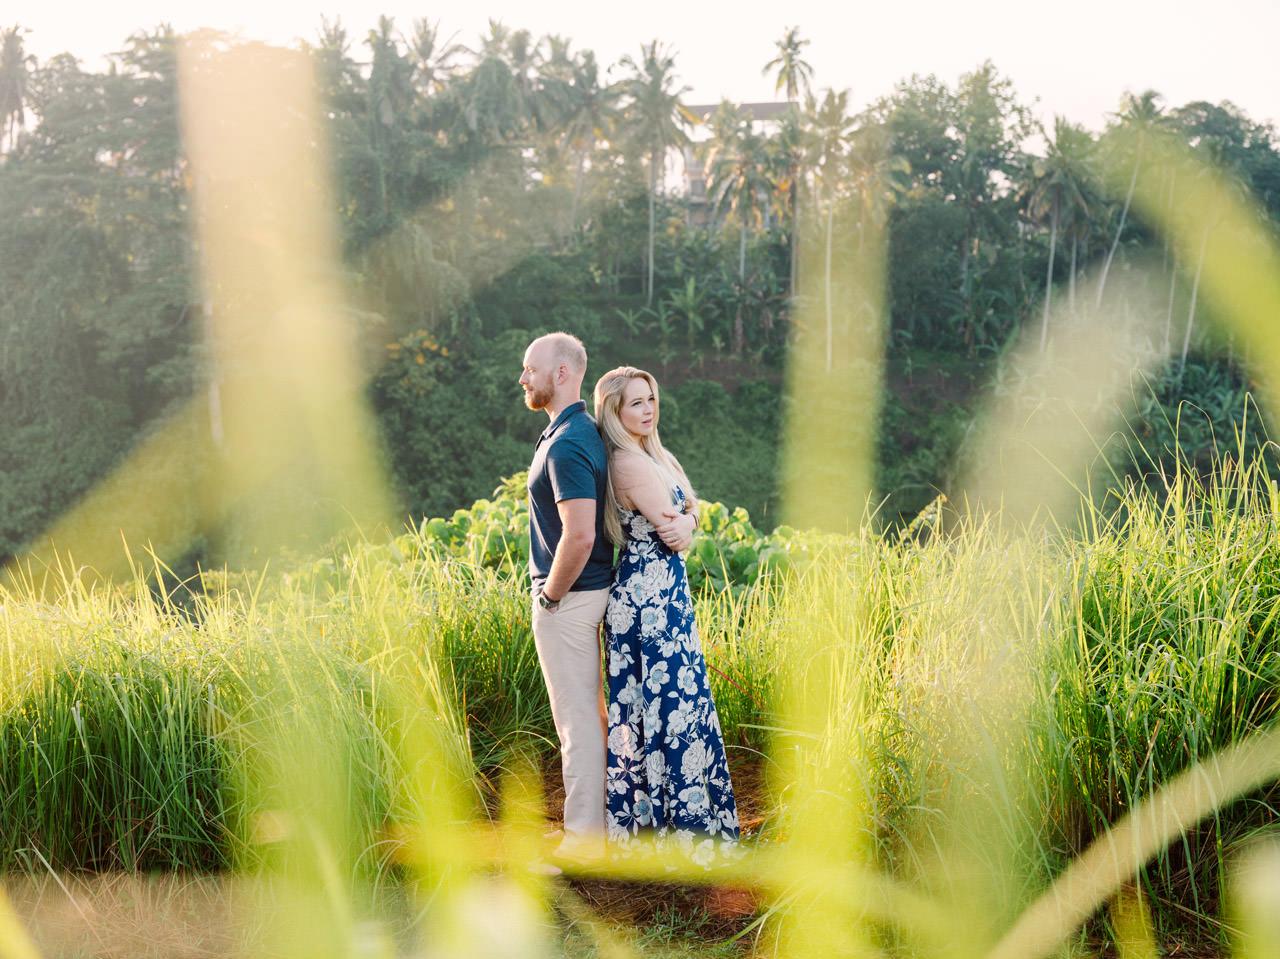 Amy & Rory: Honeymoon Photography at Campuhan Ridge Walk 7